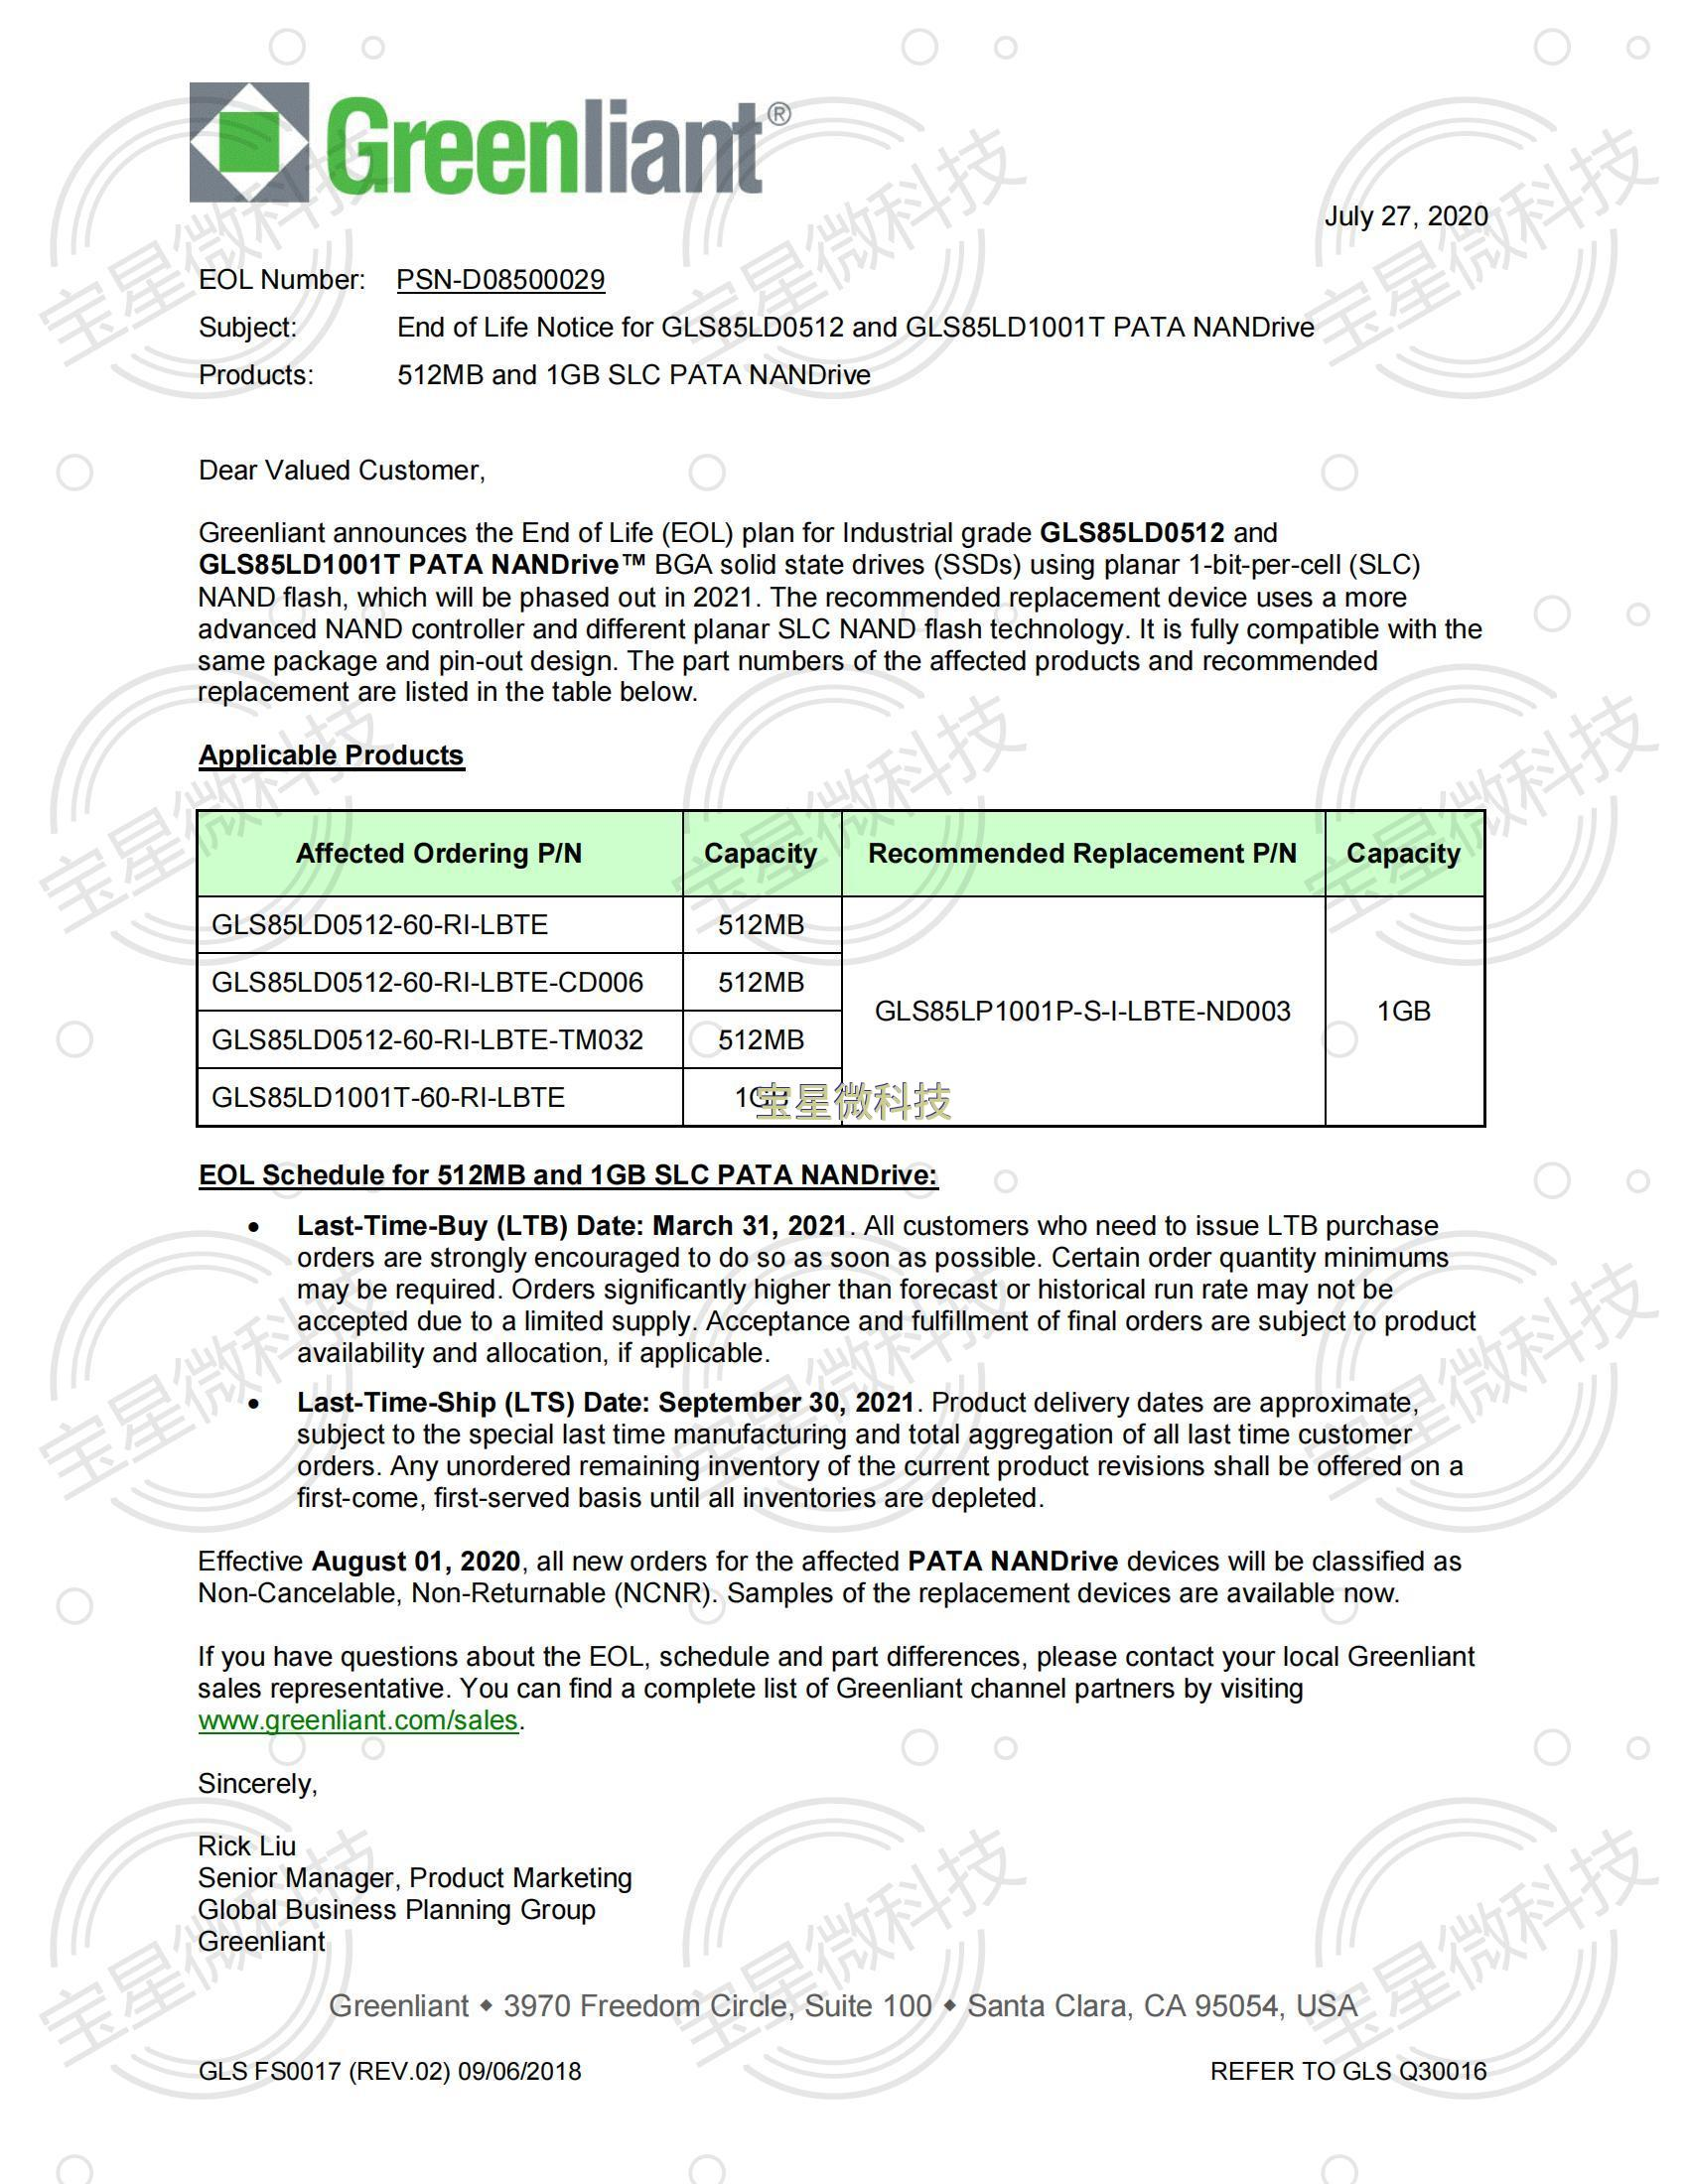 PSND08500029_EOL_for_GLS85LD_512MB1GB_SLC_PATA_NANDrive_July2020_00